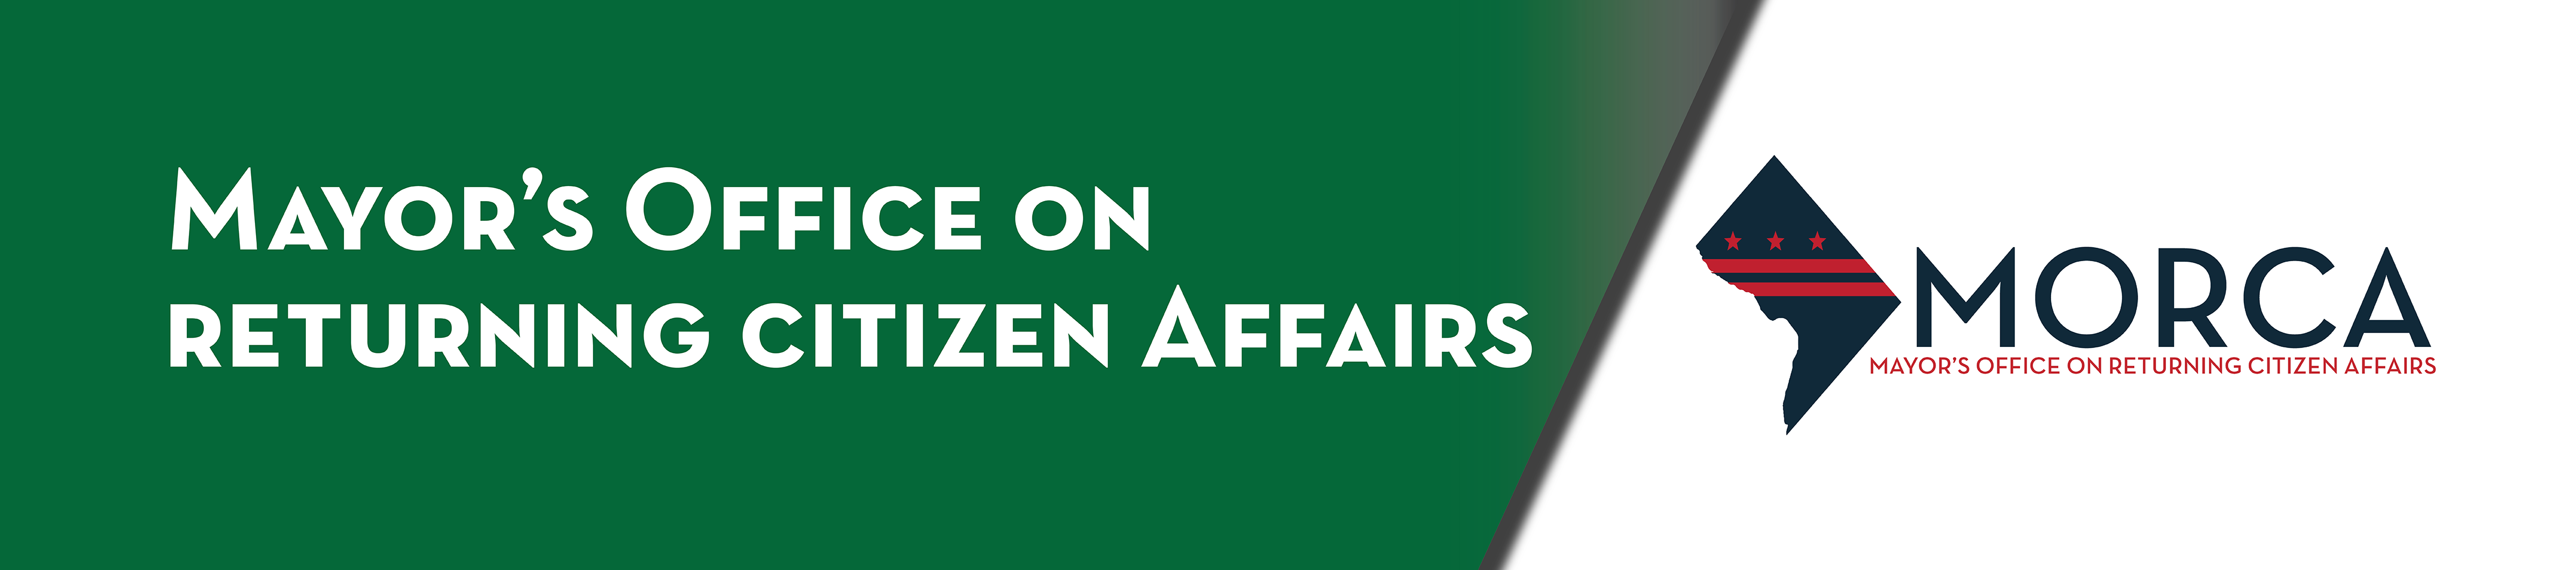 Mayor's Office on Returning Citizen Affairs